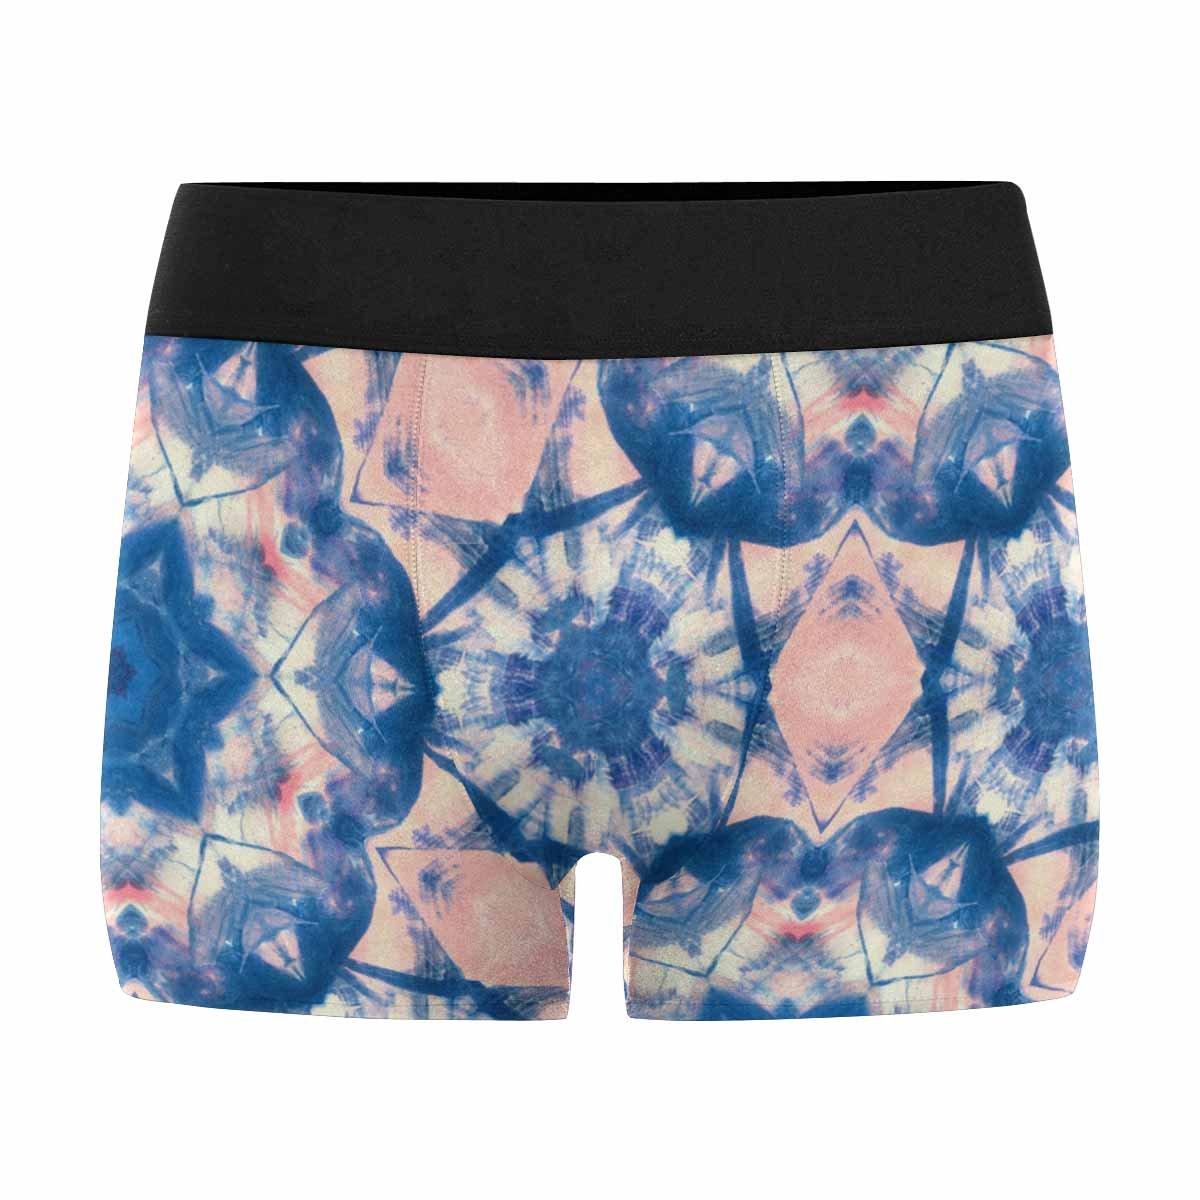 XS-3XL INTERESTPRINT Mens Boxer Briefs Underwear Abstract Hand Painted Tie Dye Shibori Watercolor Kaleidoscopic